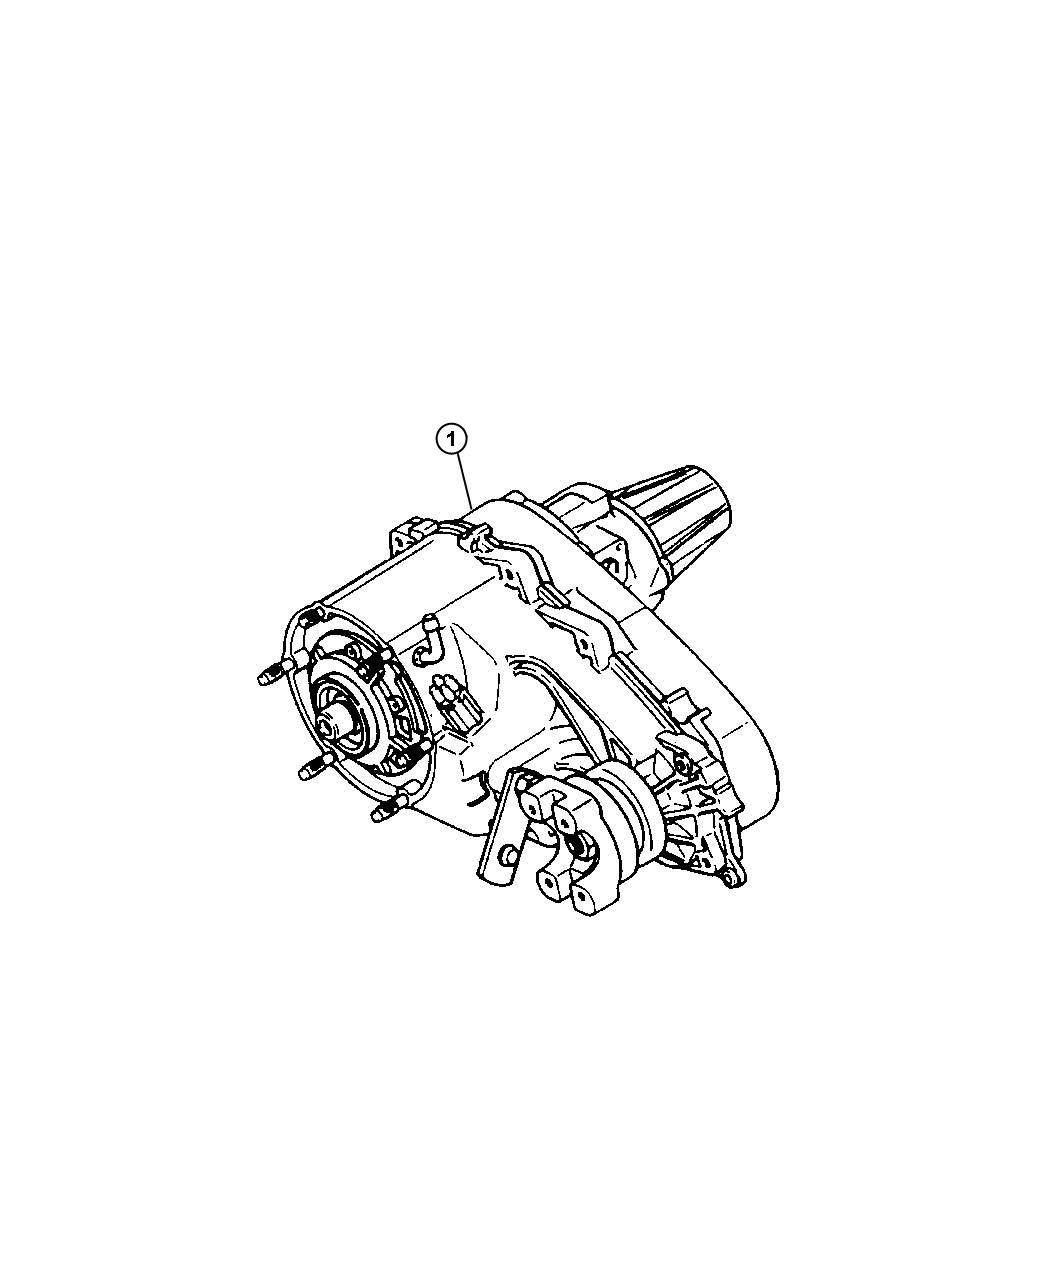 2000 Jeep Grand Cherokee Transfer case. Np242. Trac